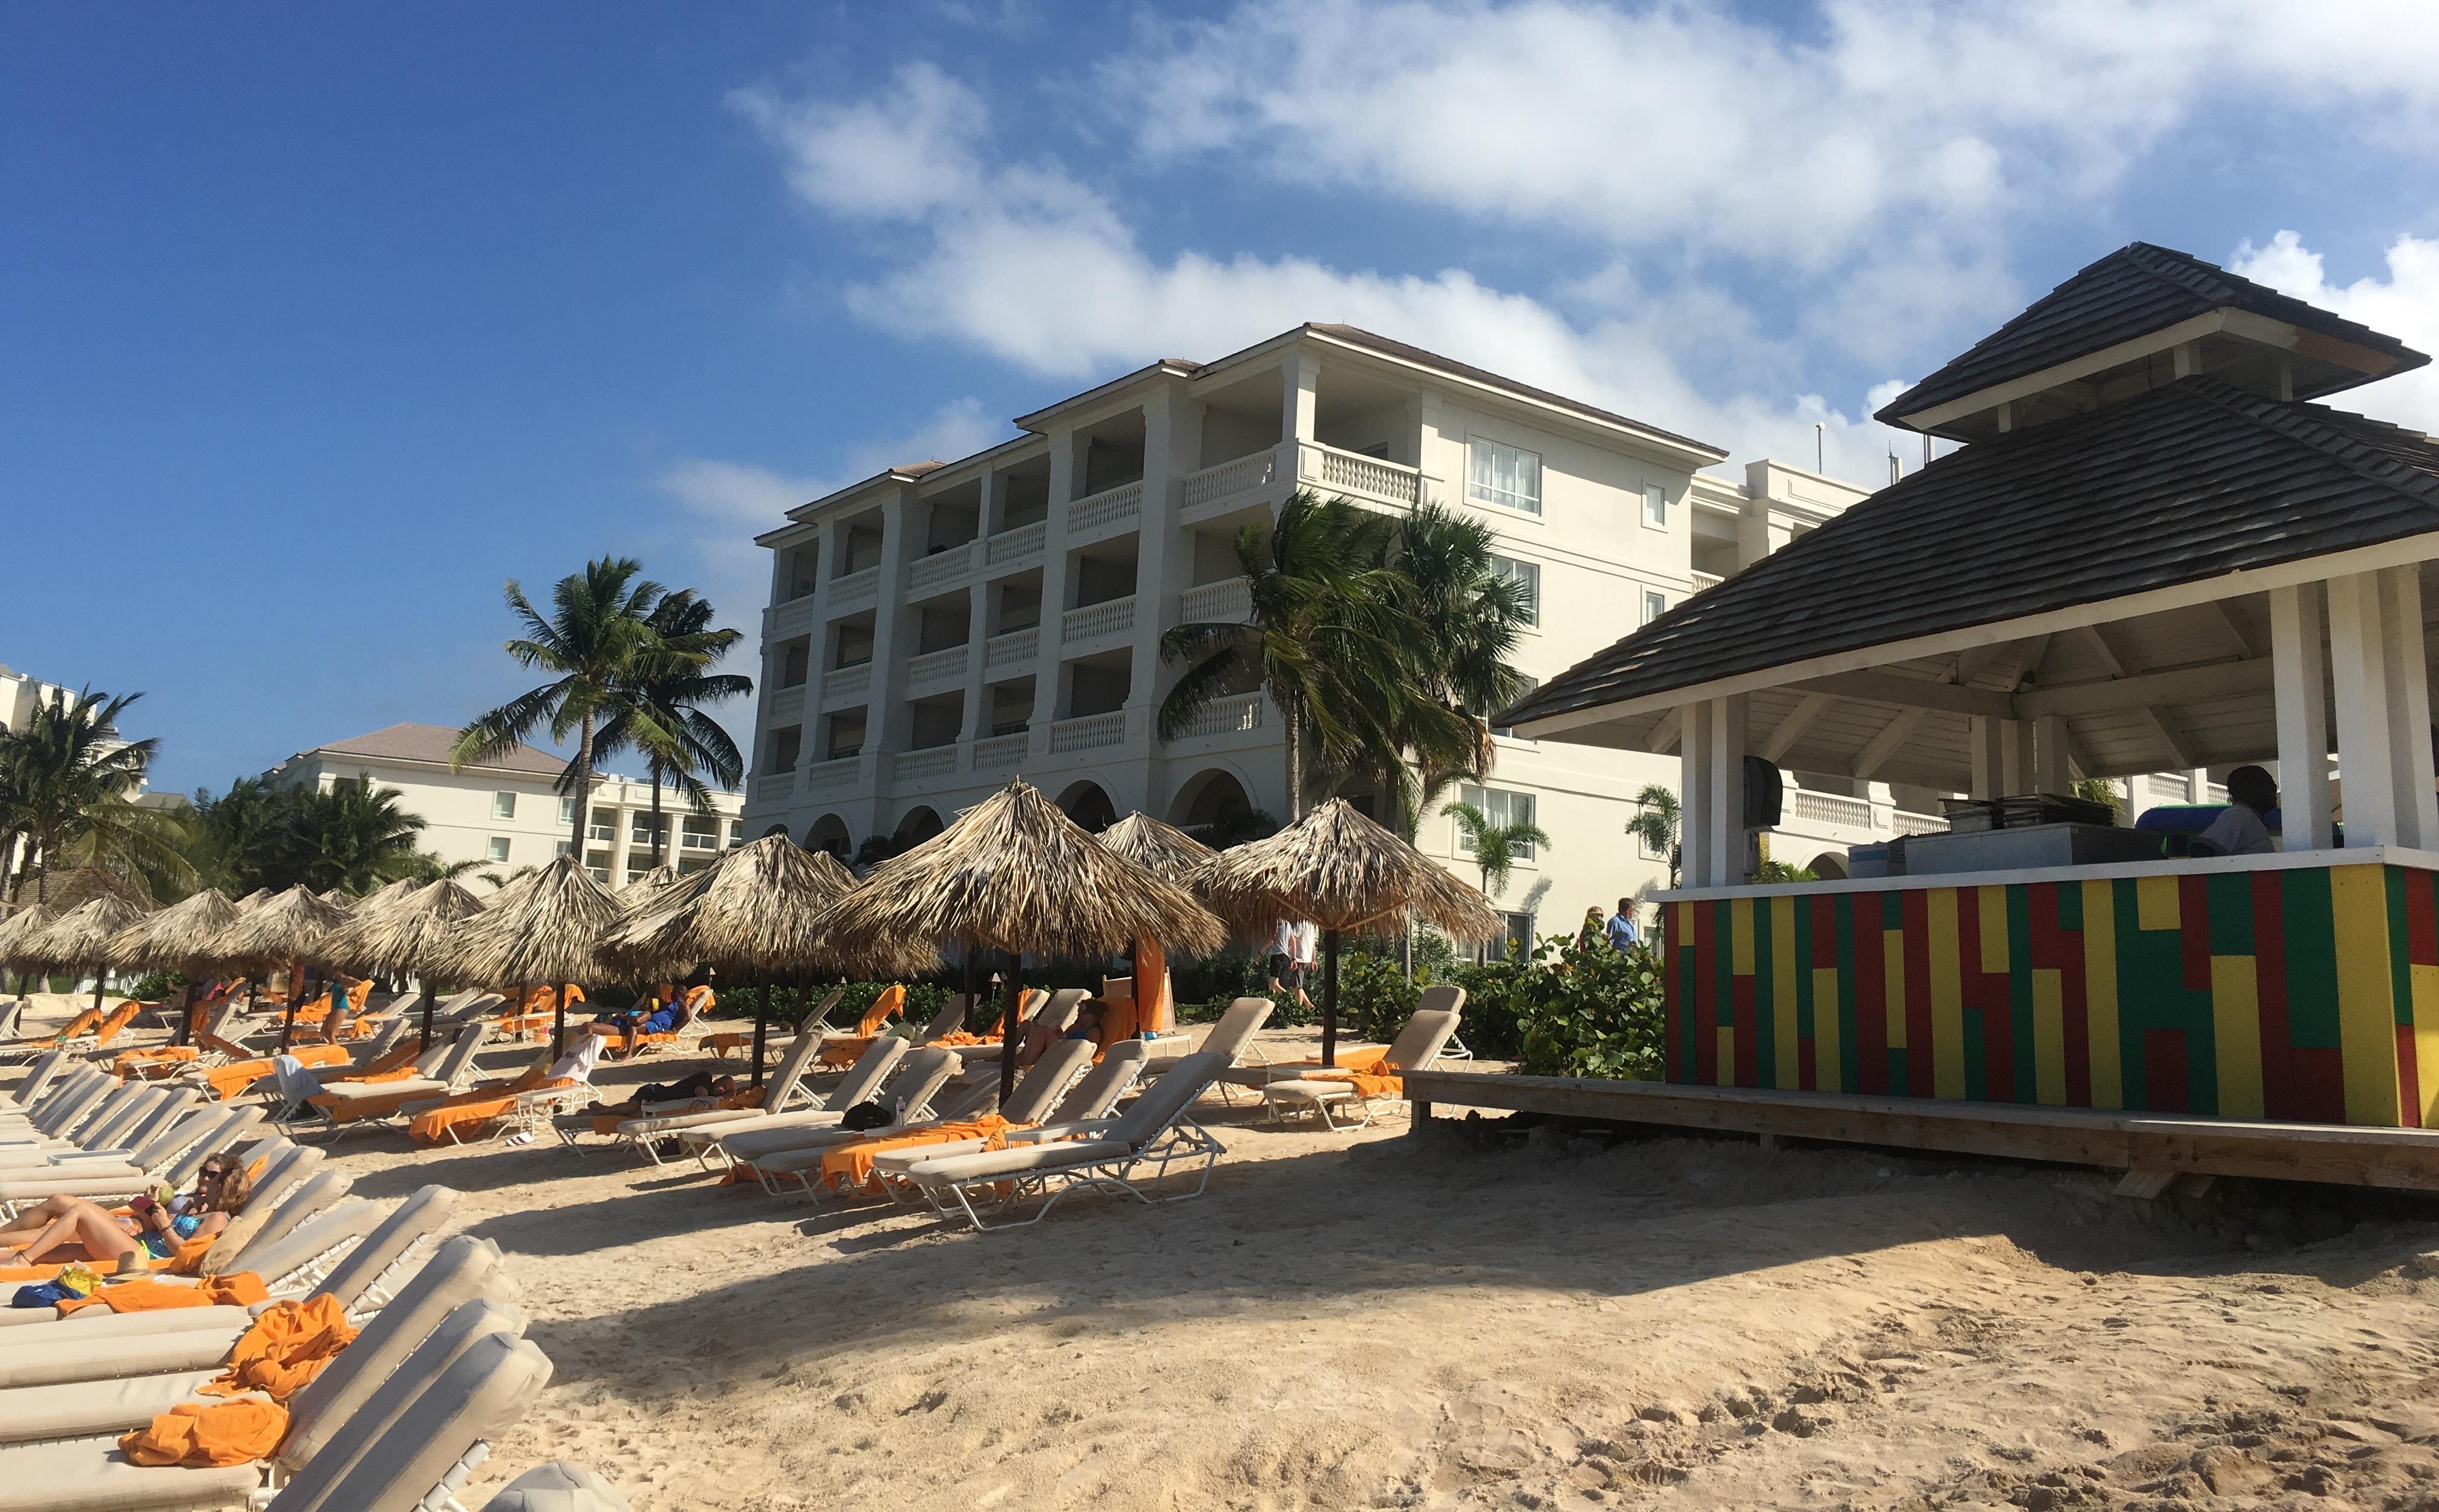 LoungeBuddy's Jamaican Retreat (Part 3)-post-image